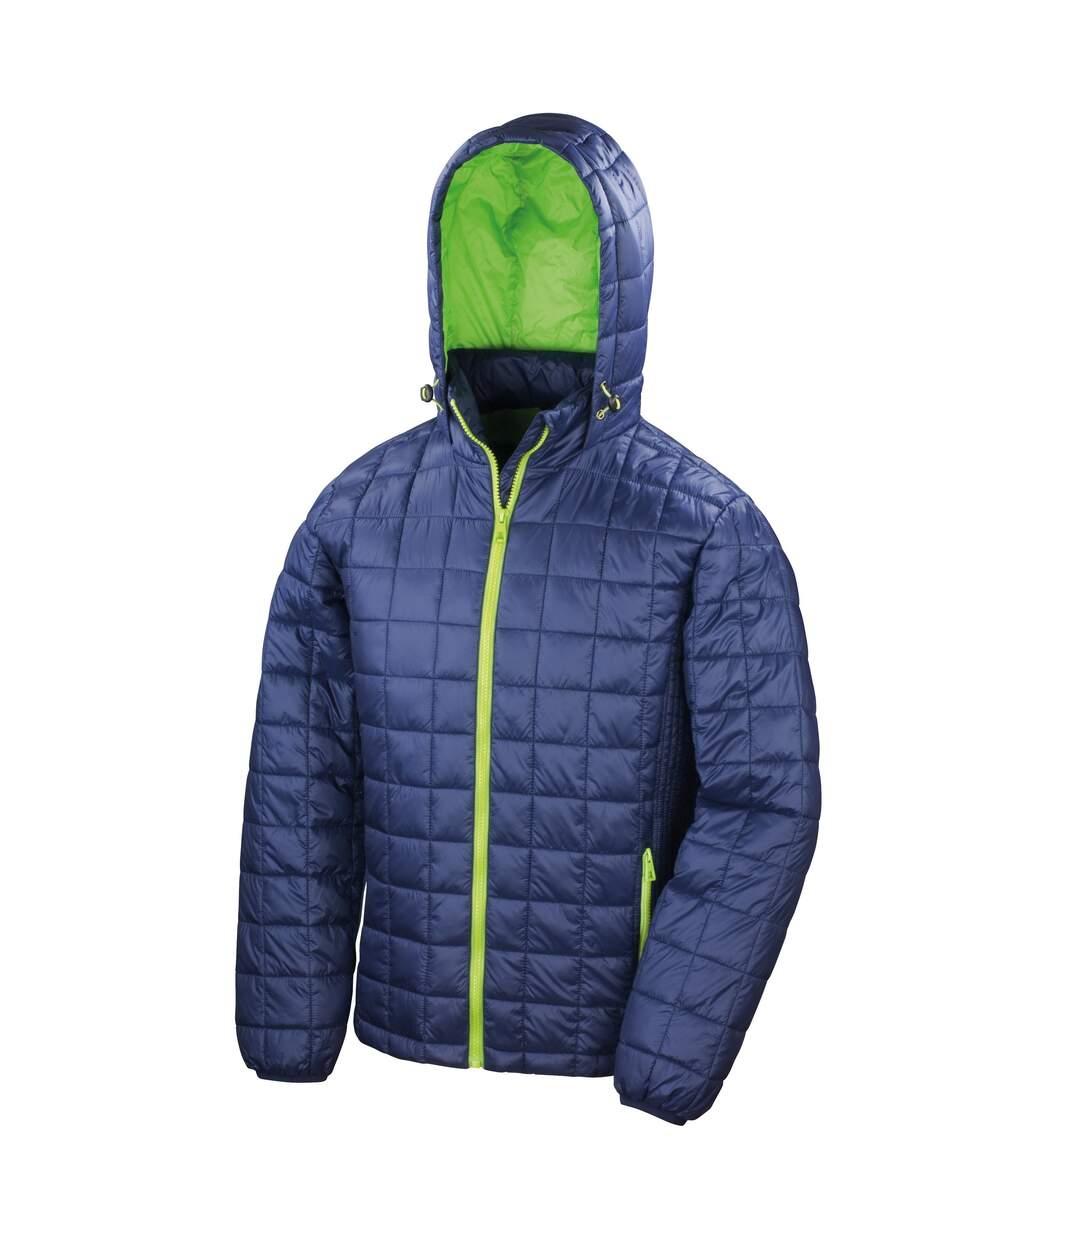 Result Adults Unisex Urban Outdoor Blizzard Jacket (Navy/Jasmine) - UTRW5159